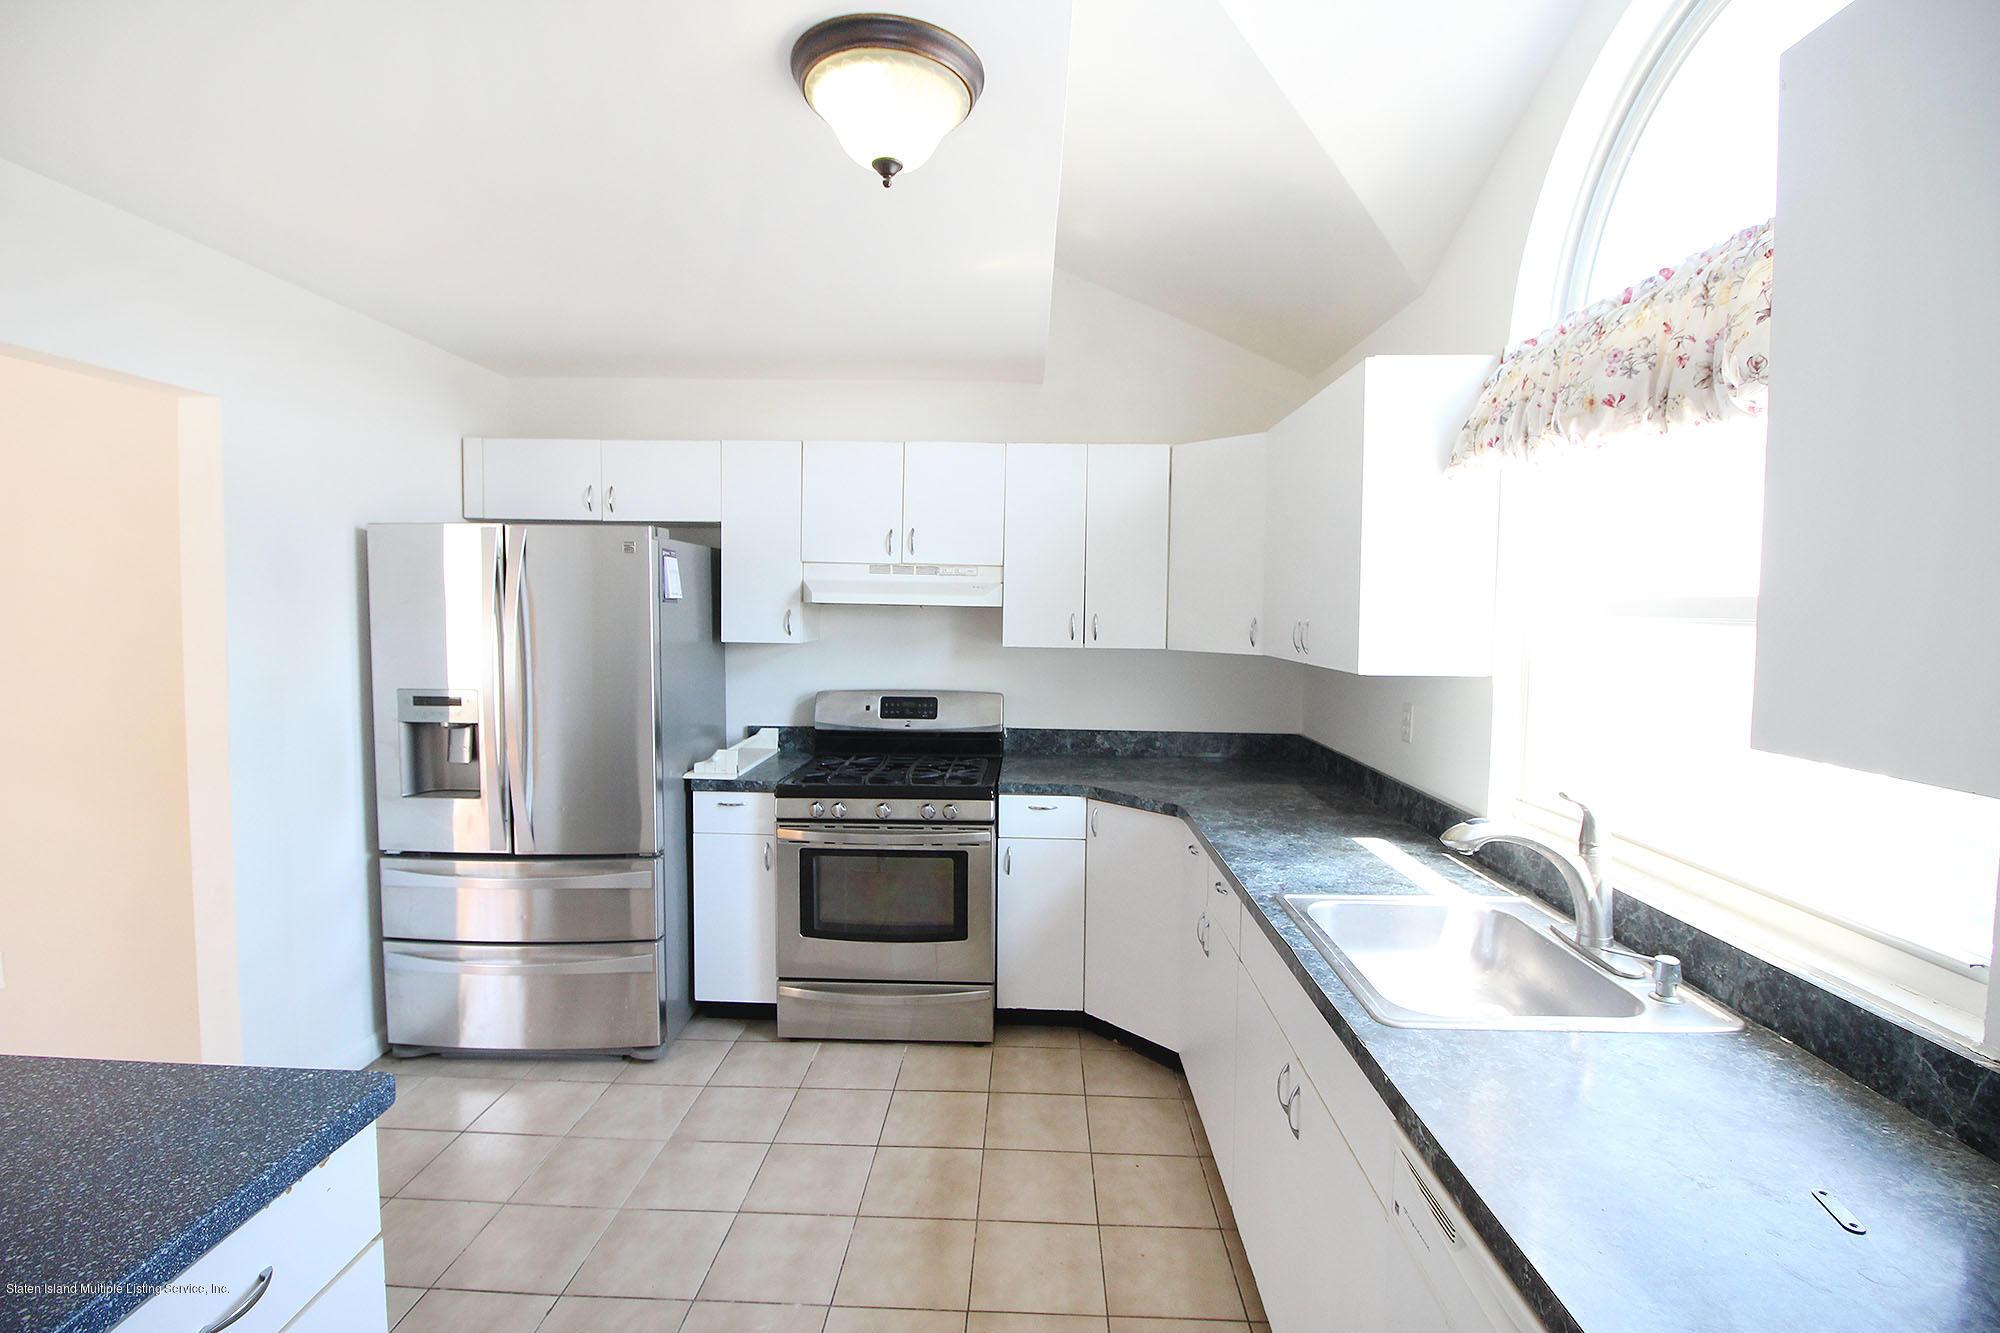 Single Family - Semi-Attached 230 Holden Boulevard  Staten Island, NY 10314, MLS-1139241-6